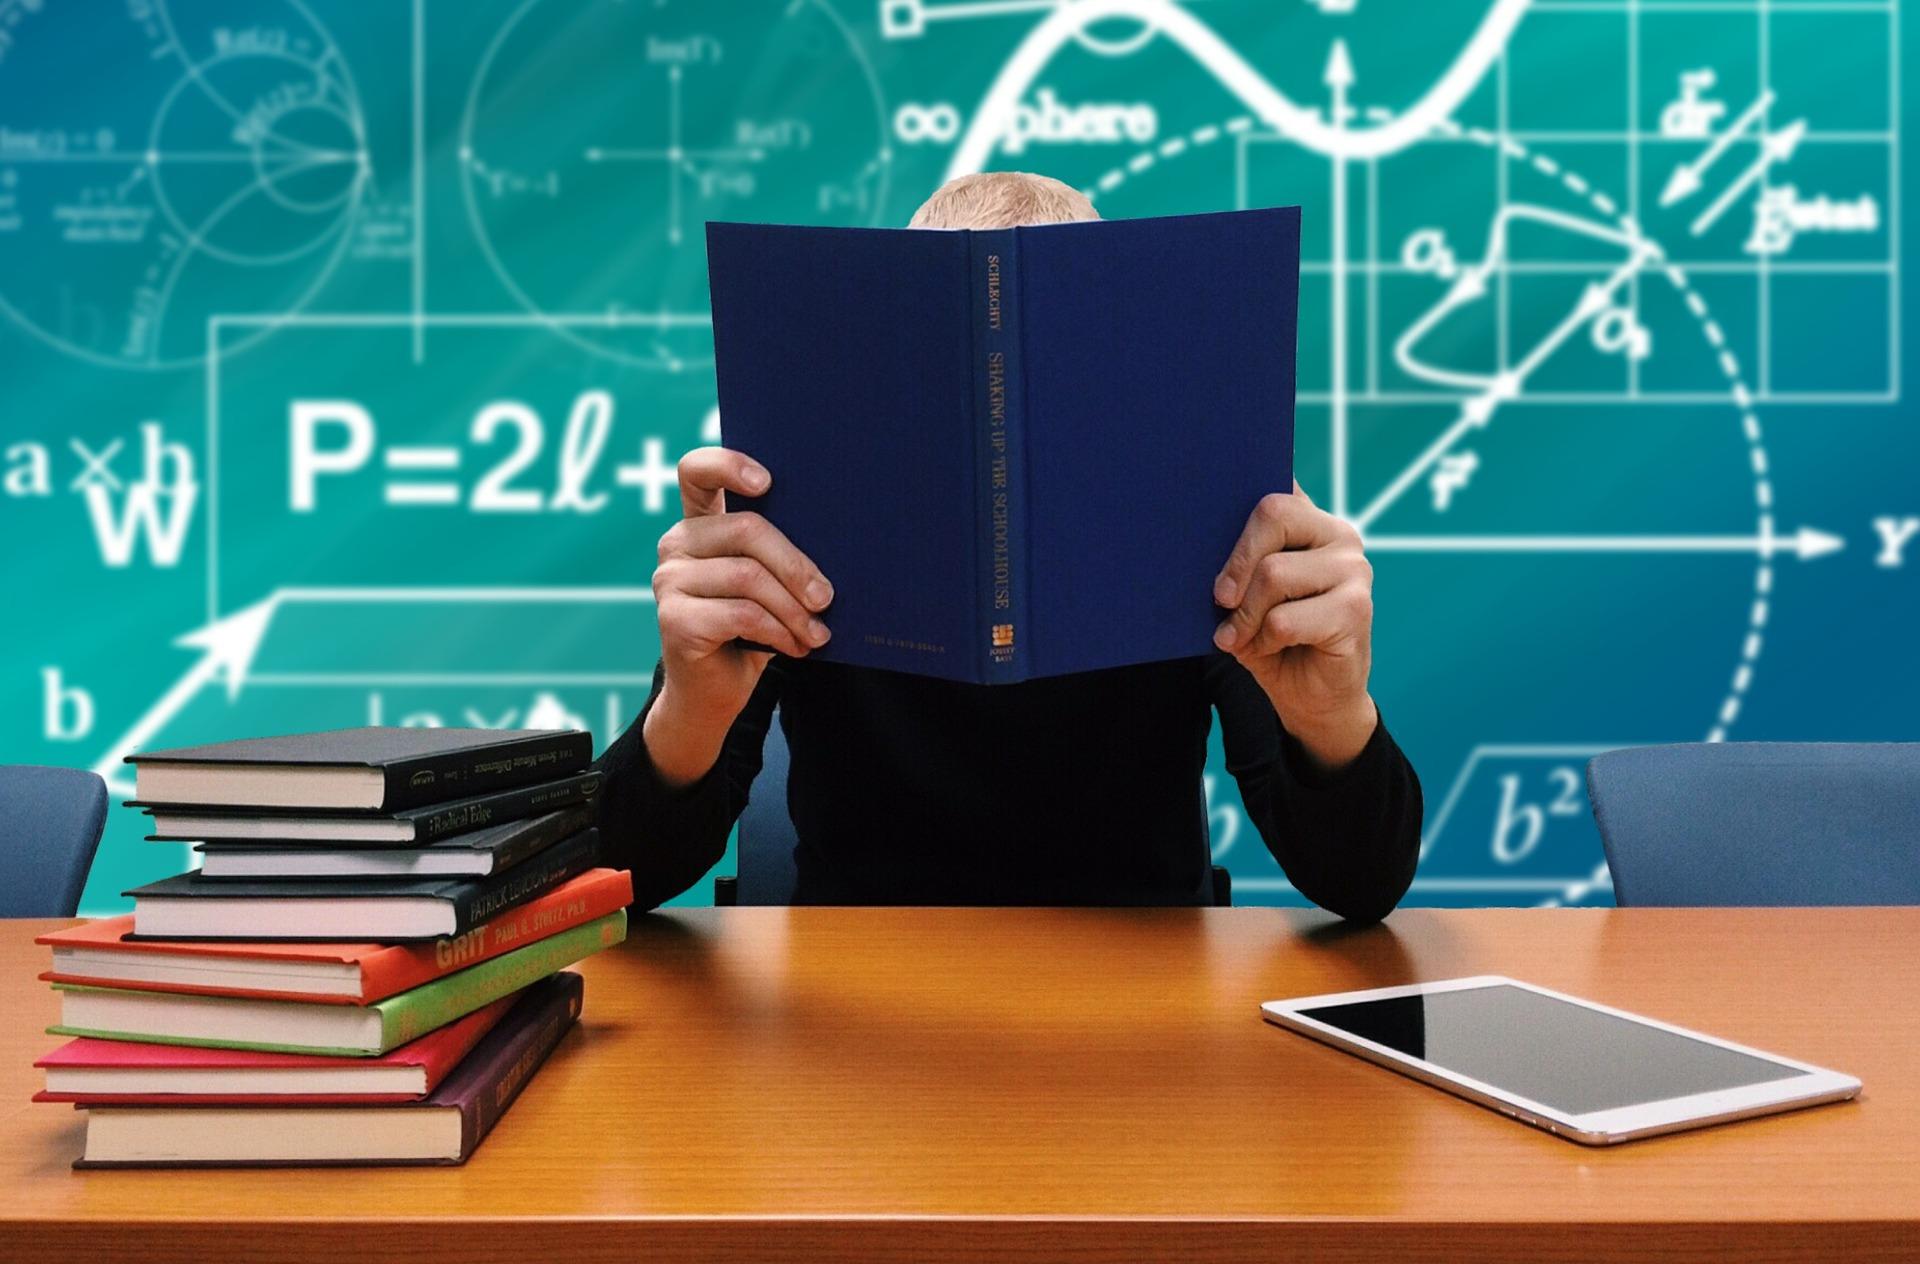 【FX初心者】資産を増やす効率的なFX勉強法【具体例で解説】